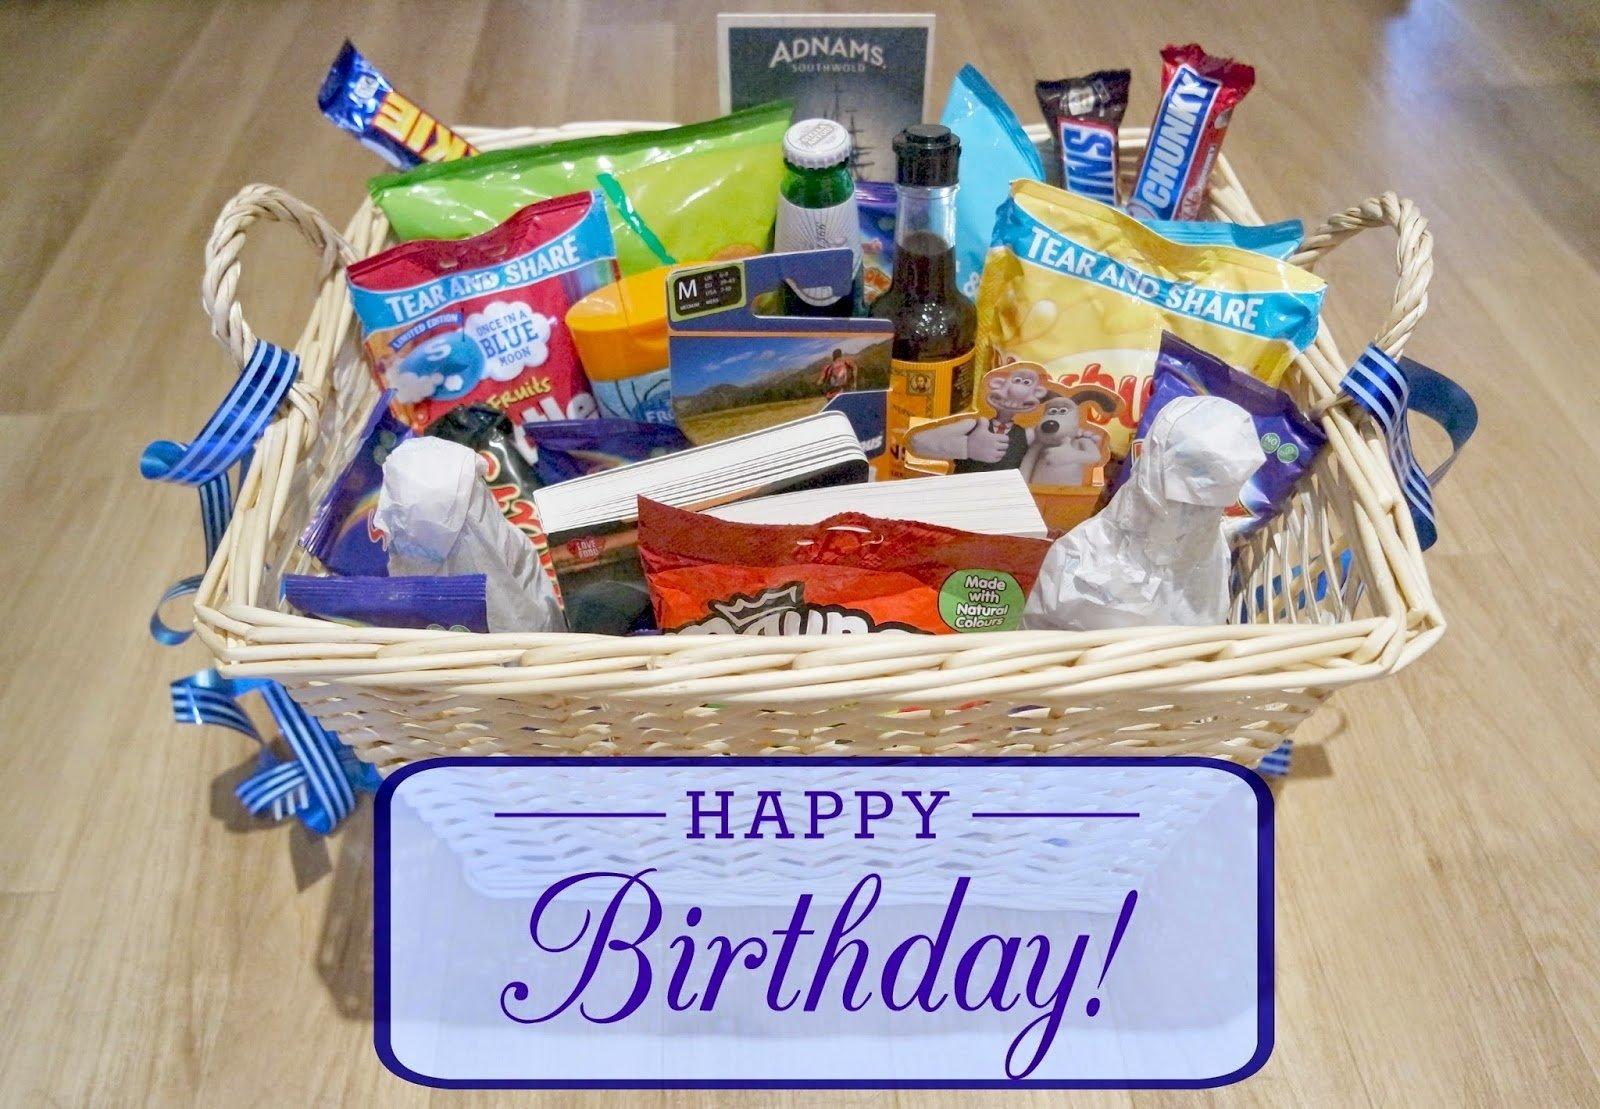 10 Pretty 50 Birthday Gift Ideas For Her uptown peach my dads 50th birthday hamper mens gift ideas 18